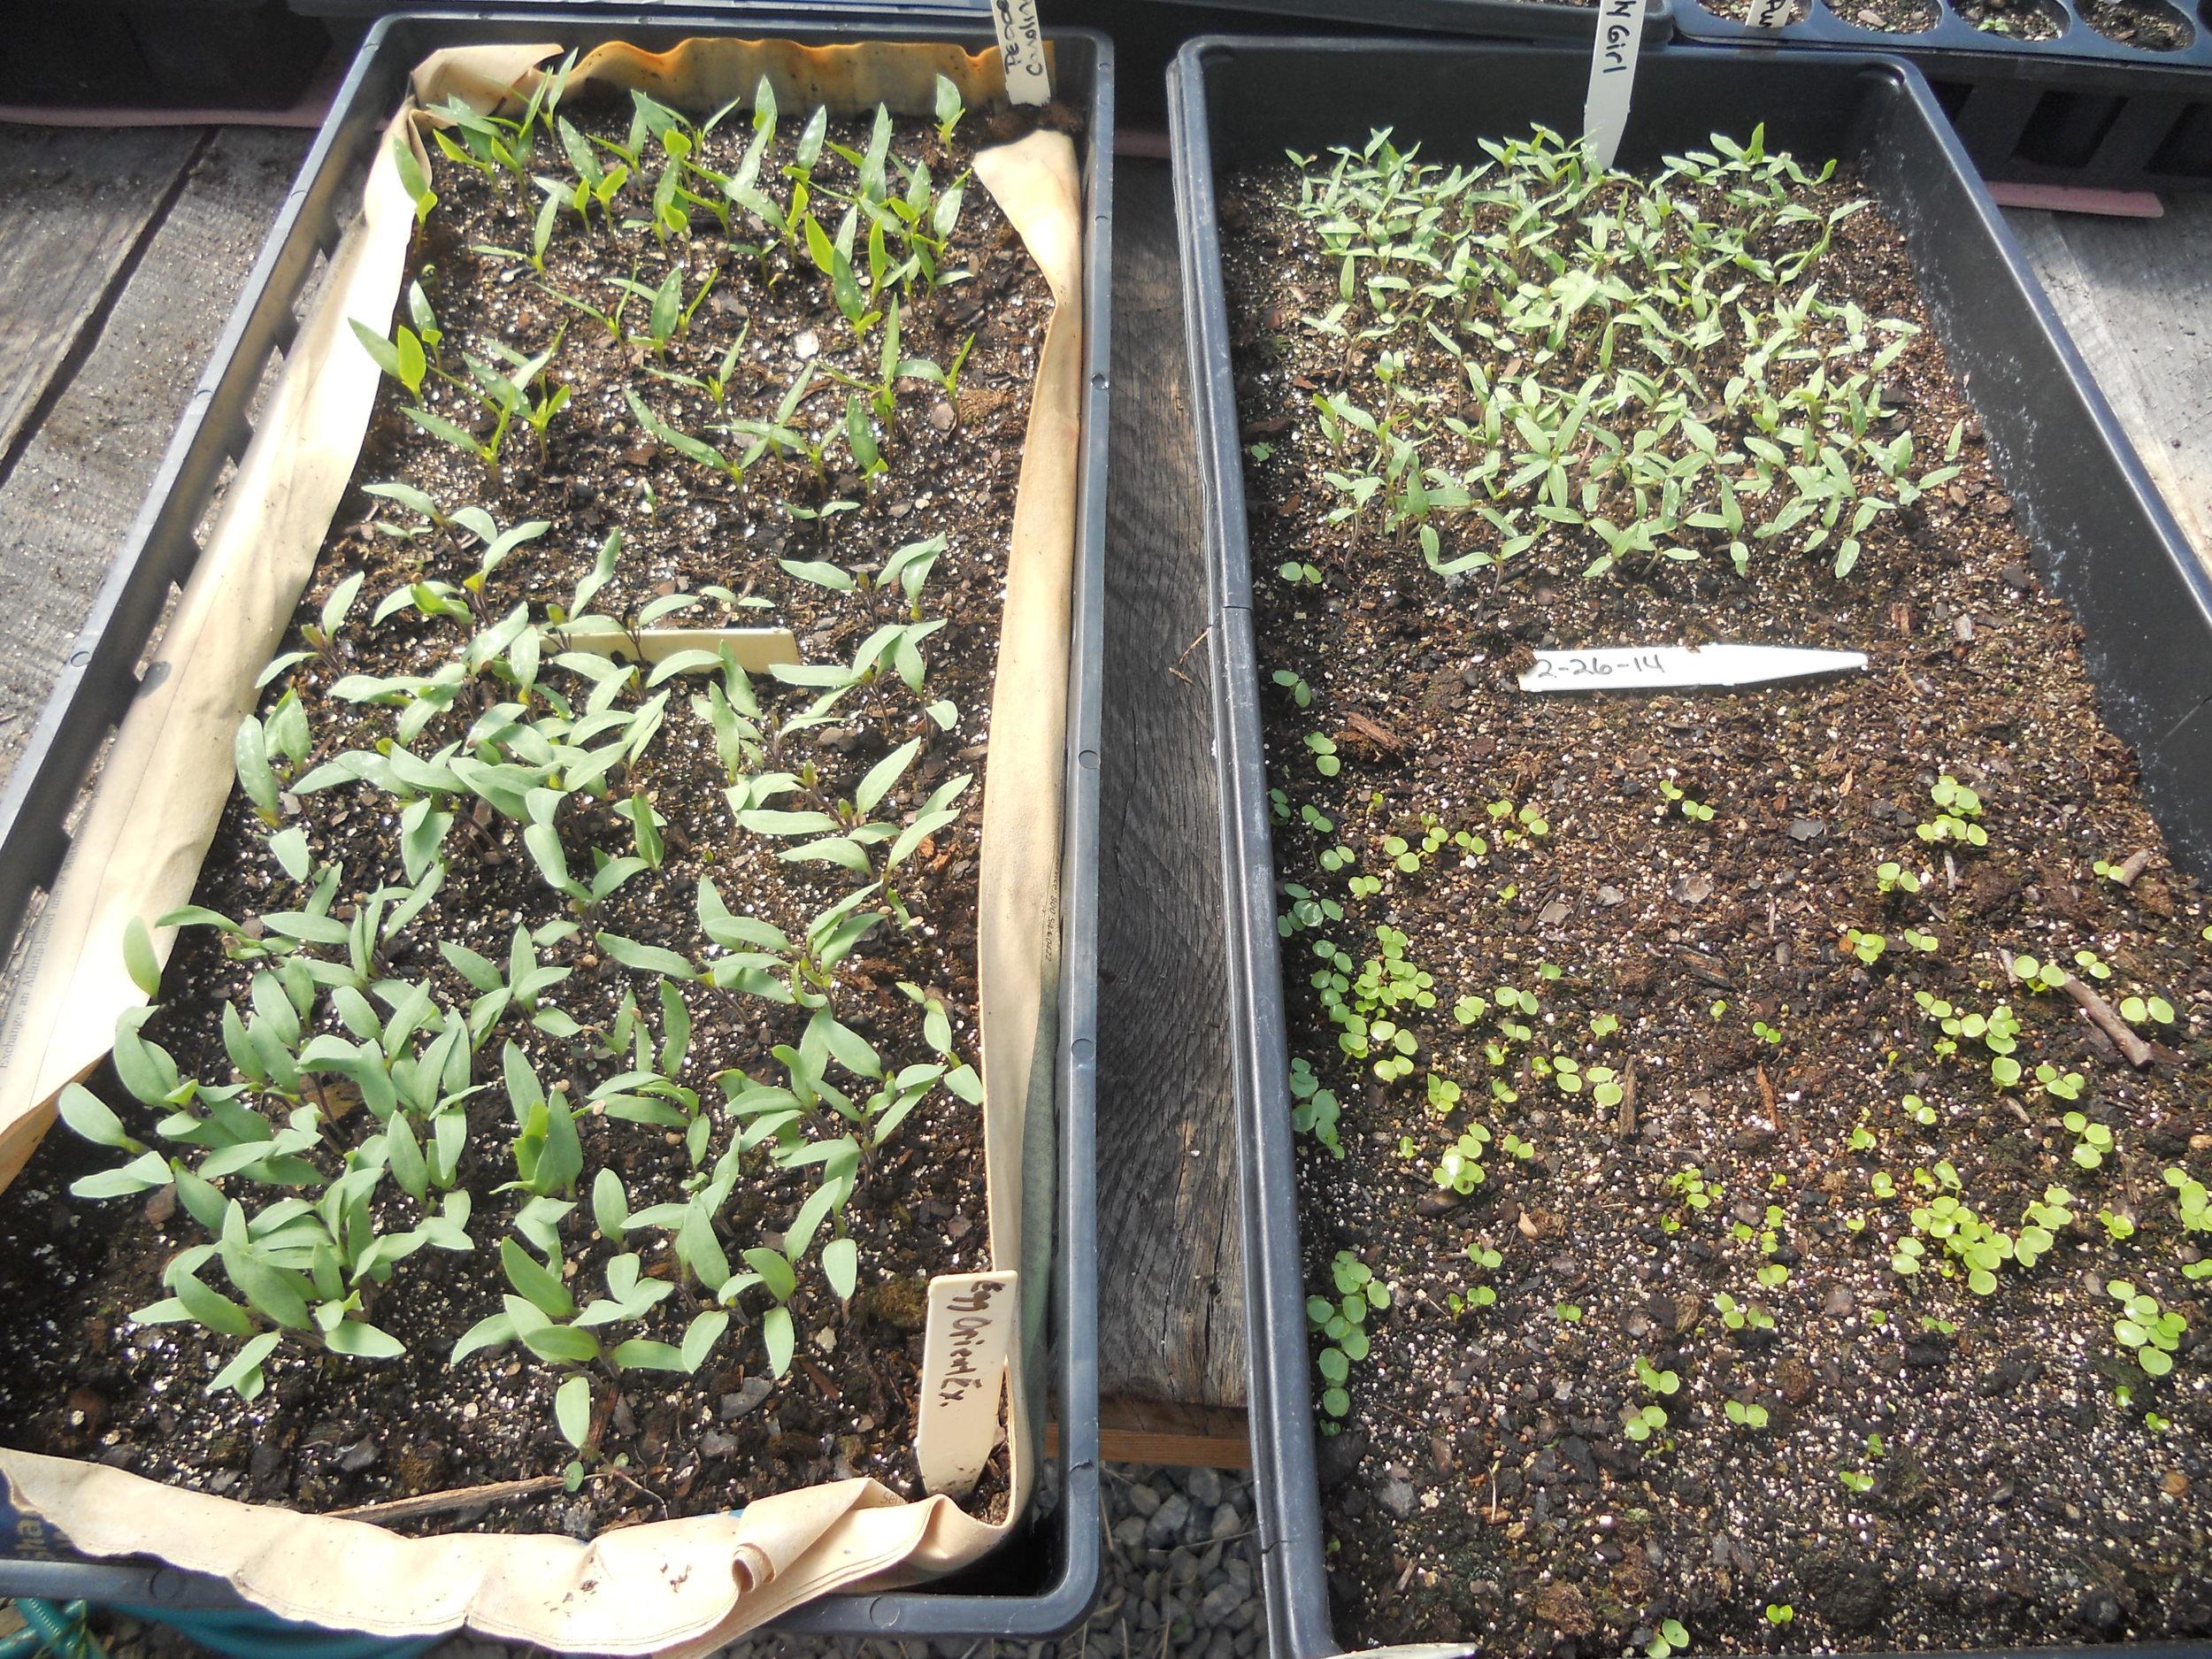 eggplant, pepper, tomato and impatien sprouts